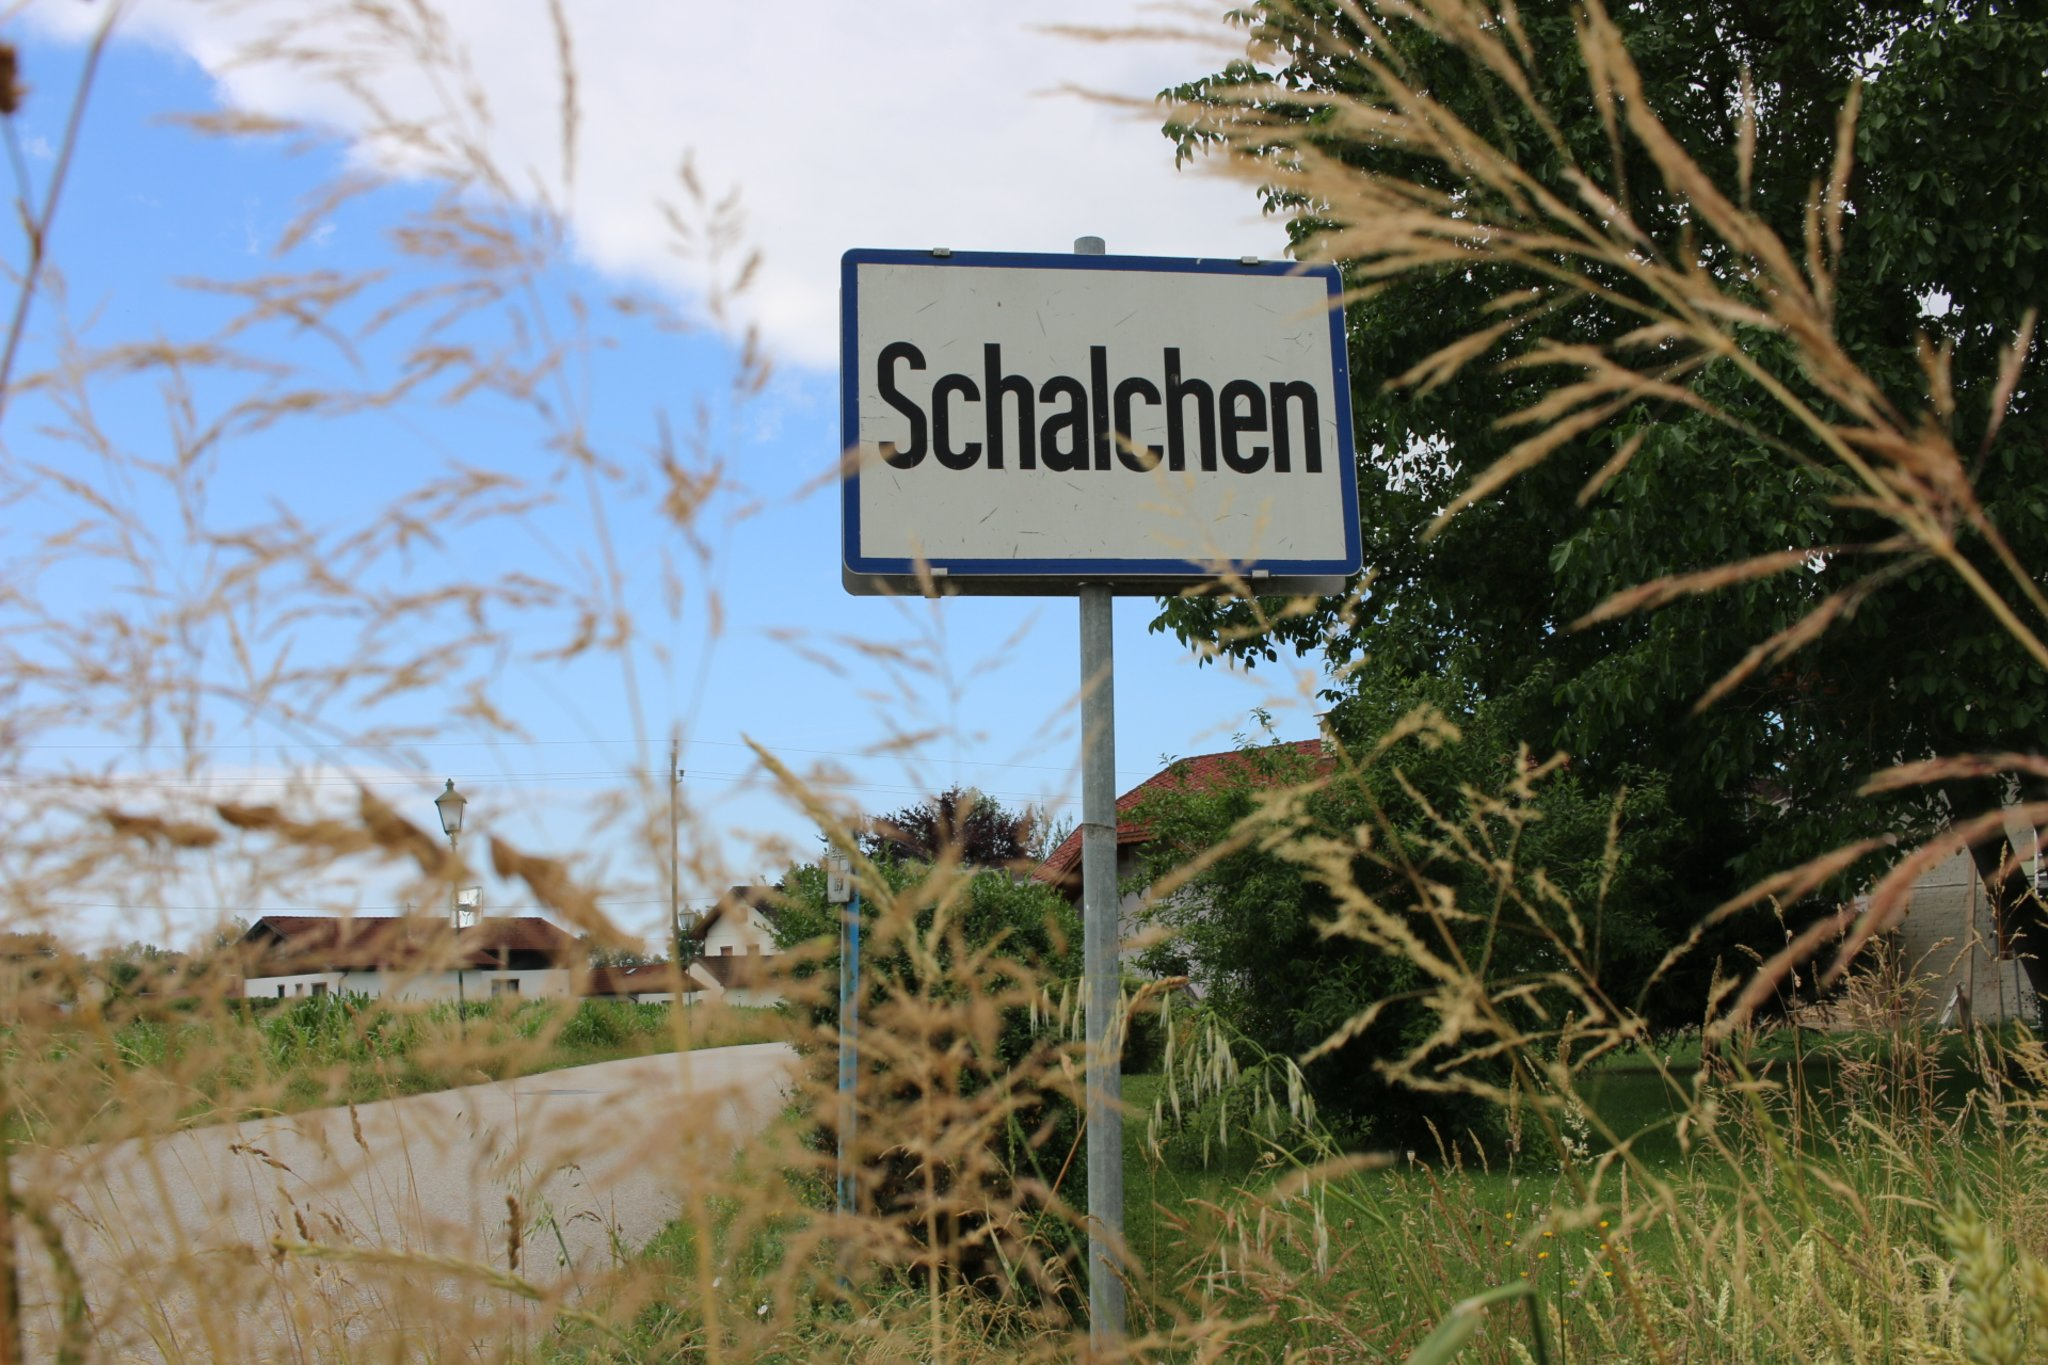 Schalchen - Thema auf comunidadelectronica.com